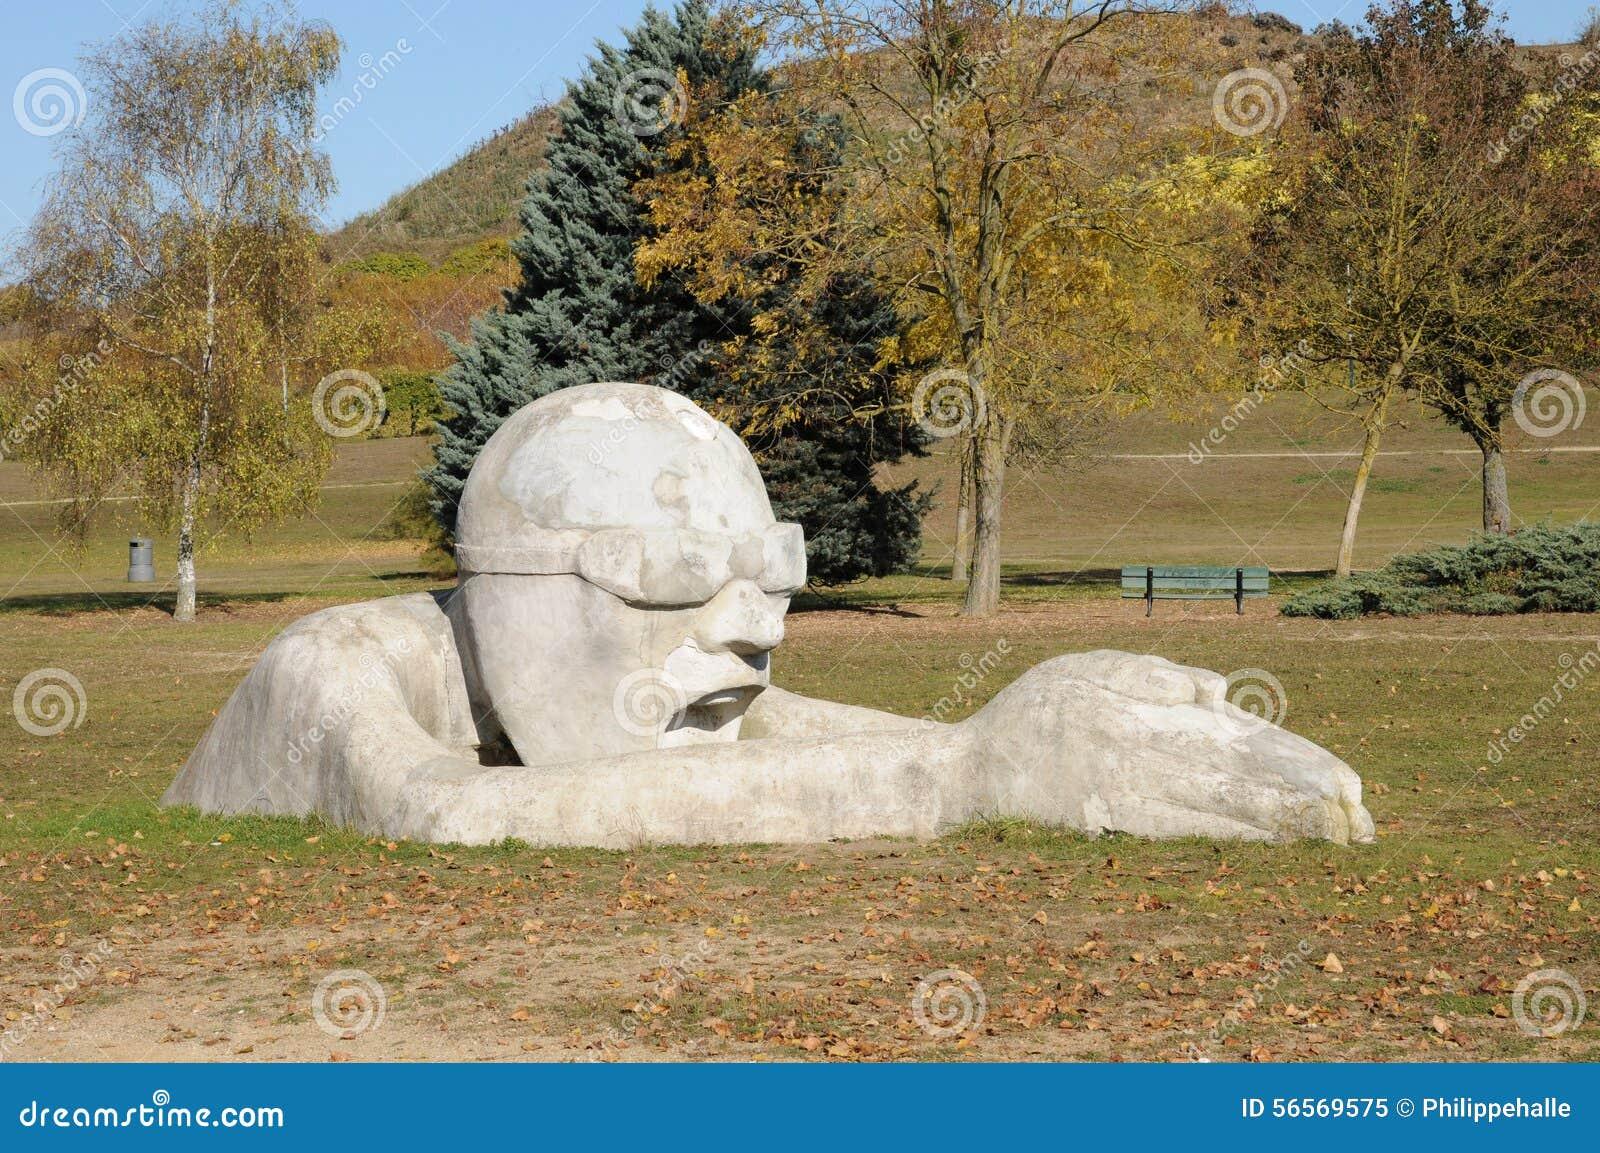 Download Γαλλία, πάρκο Sautour σε Les Mureaux Εκδοτική εικόνα - εικόνα από εξωτερικό, γαλλία: 56569575